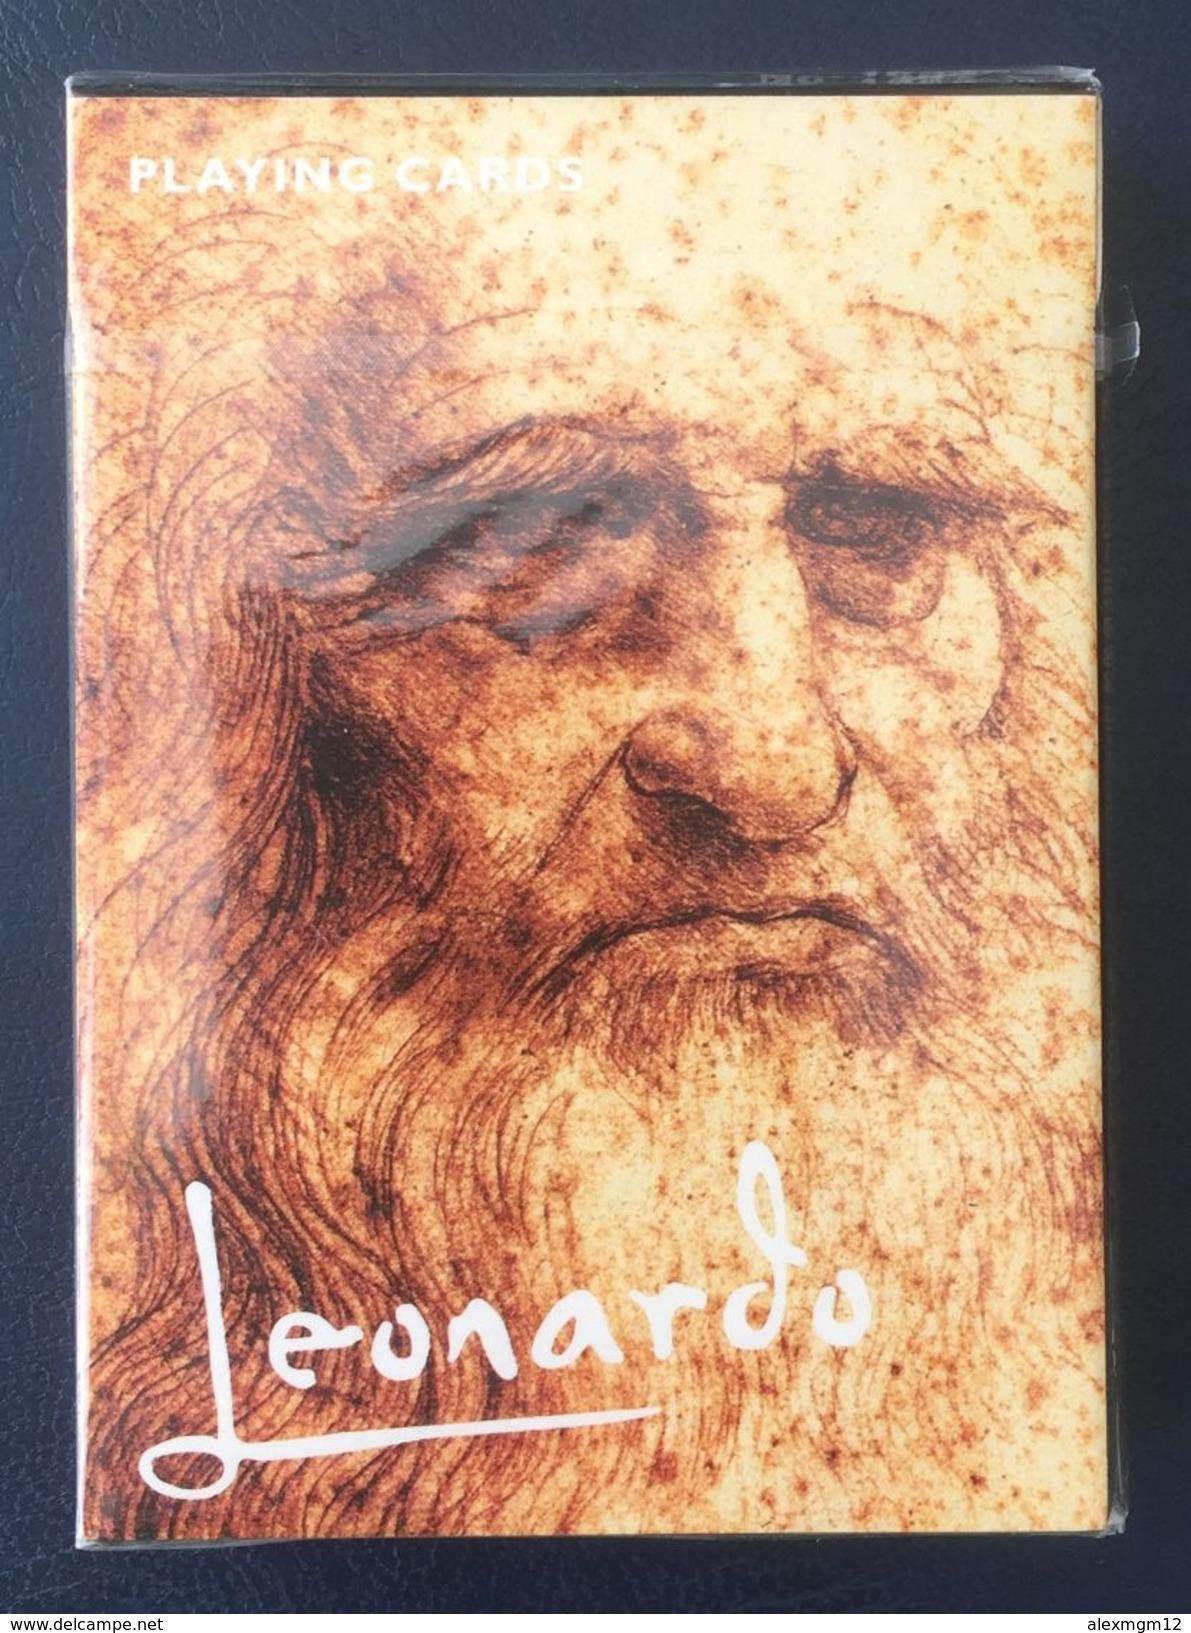 Leonardo Playing Cards, Piatnik, Austria, New, Sealed - Playing Cards (classic)